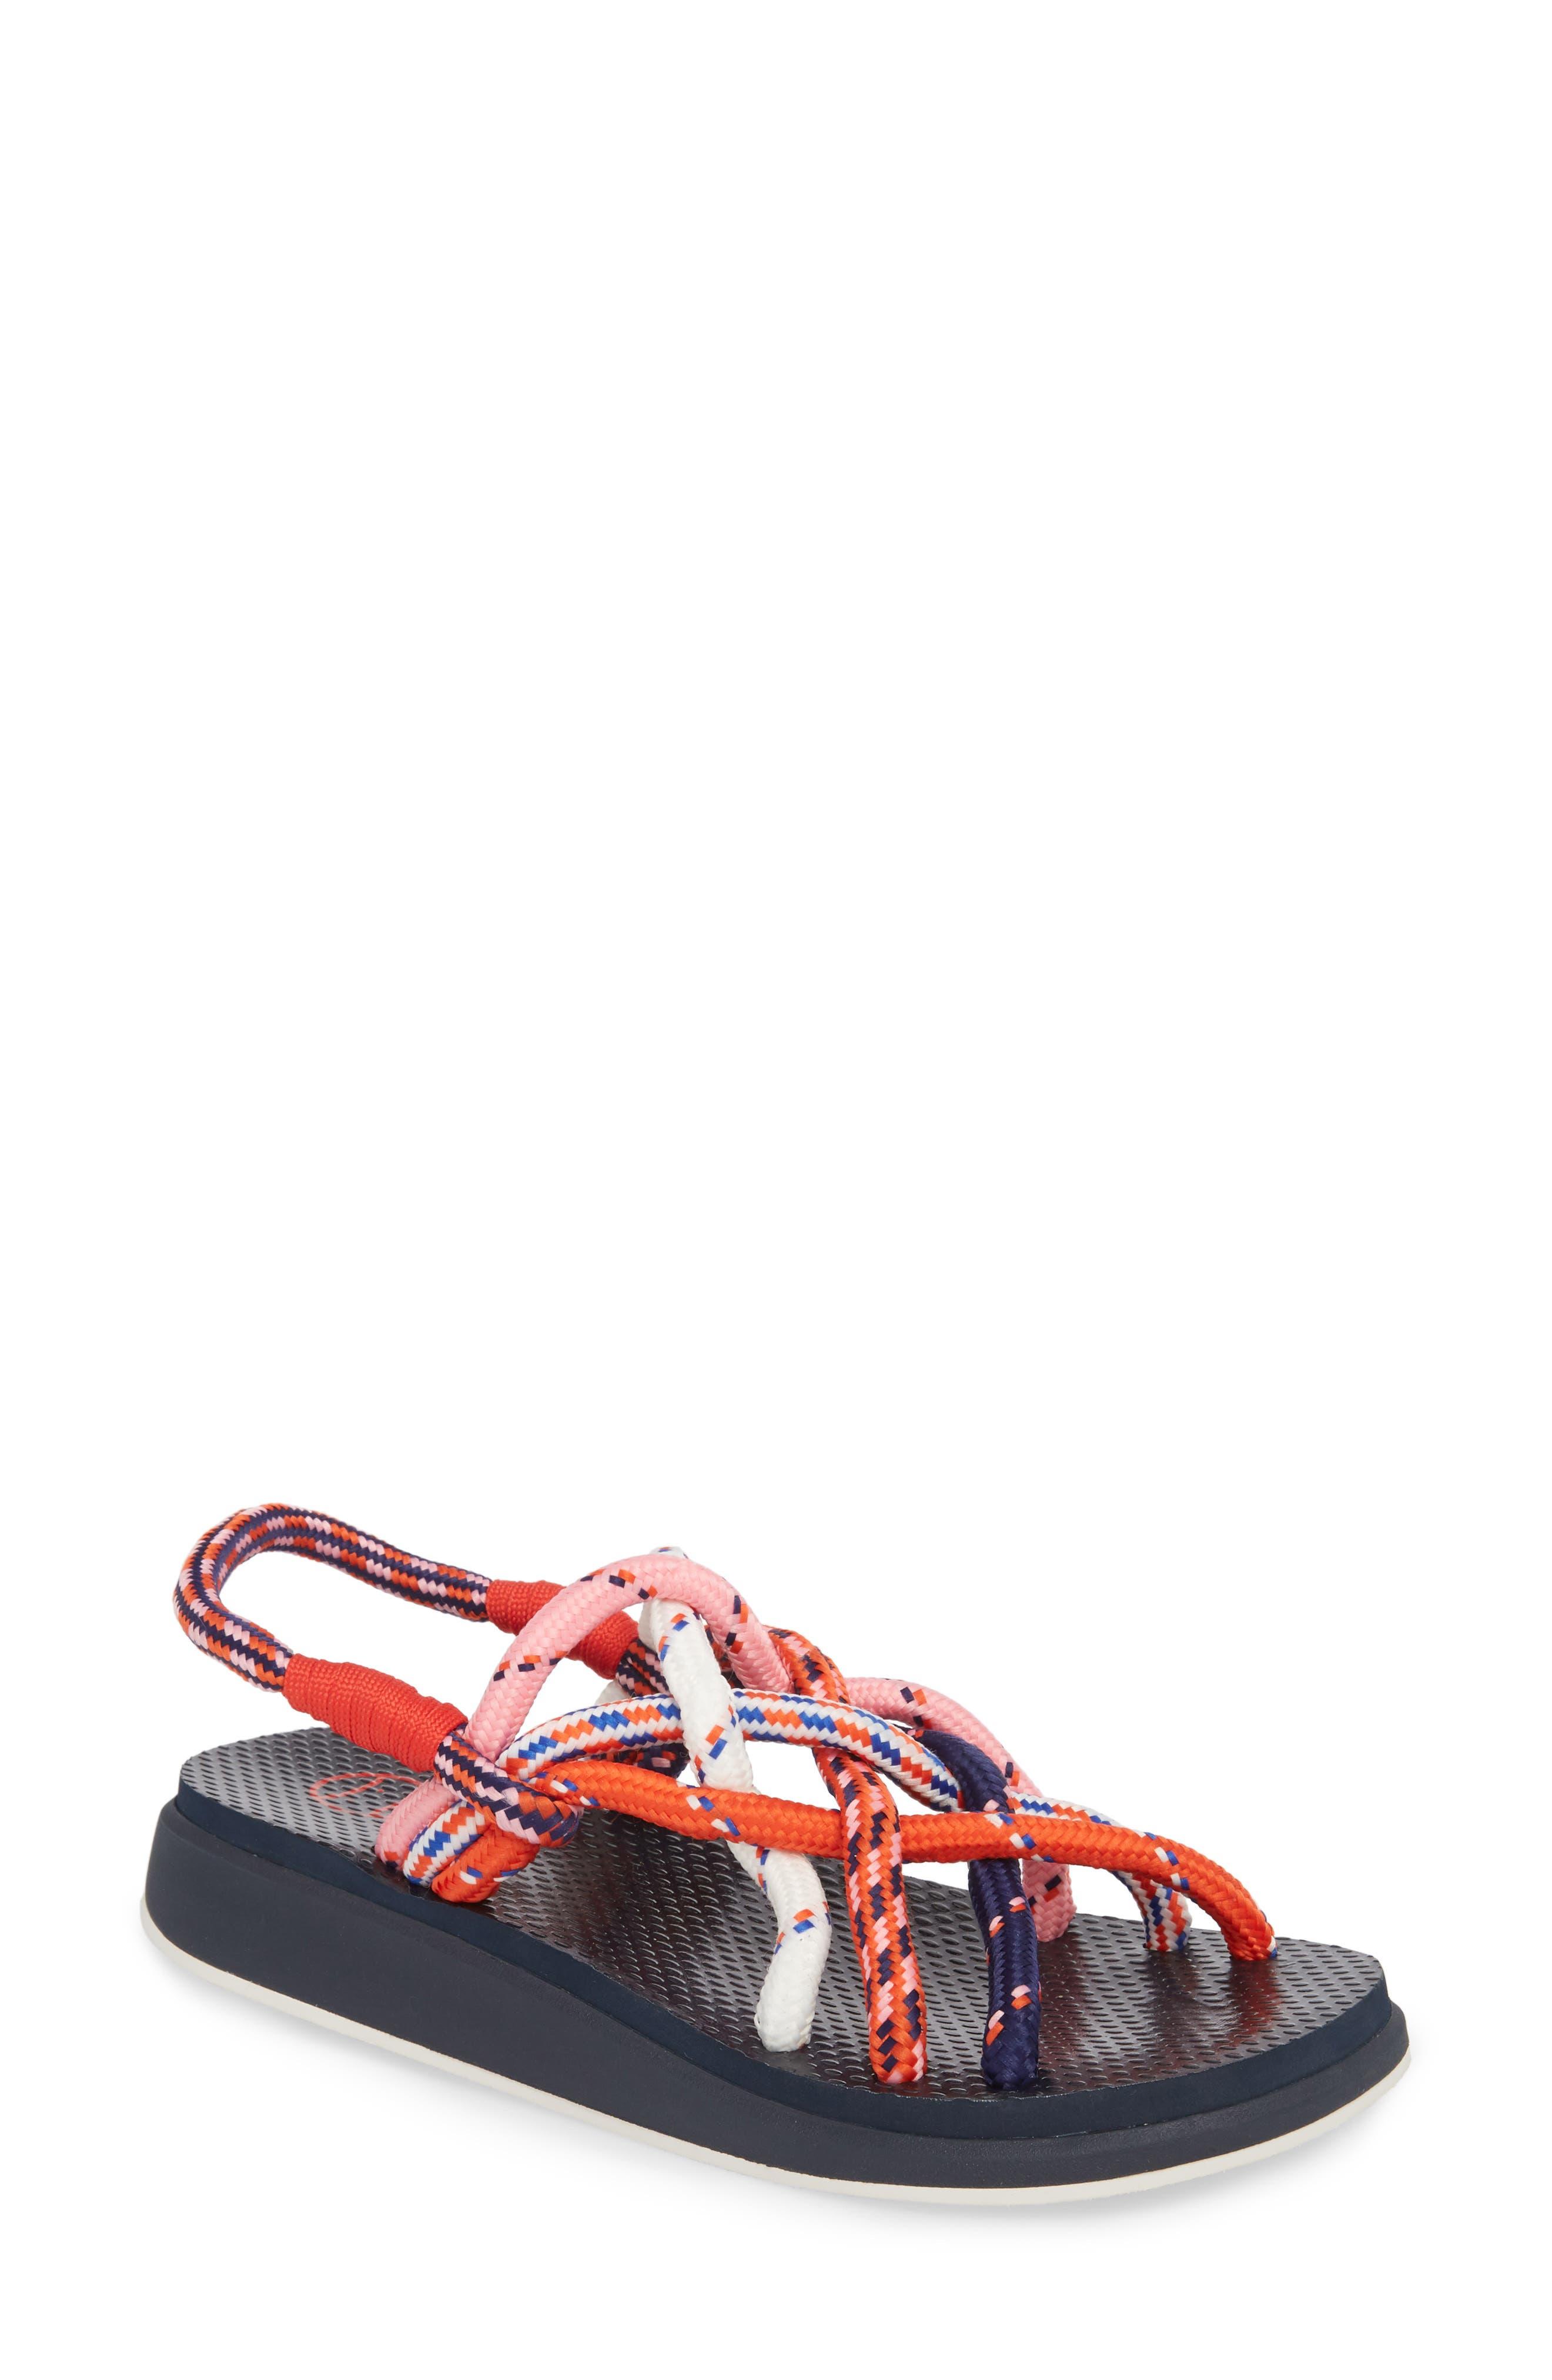 Rope Sandal,                         Main,                         color, Red Multi